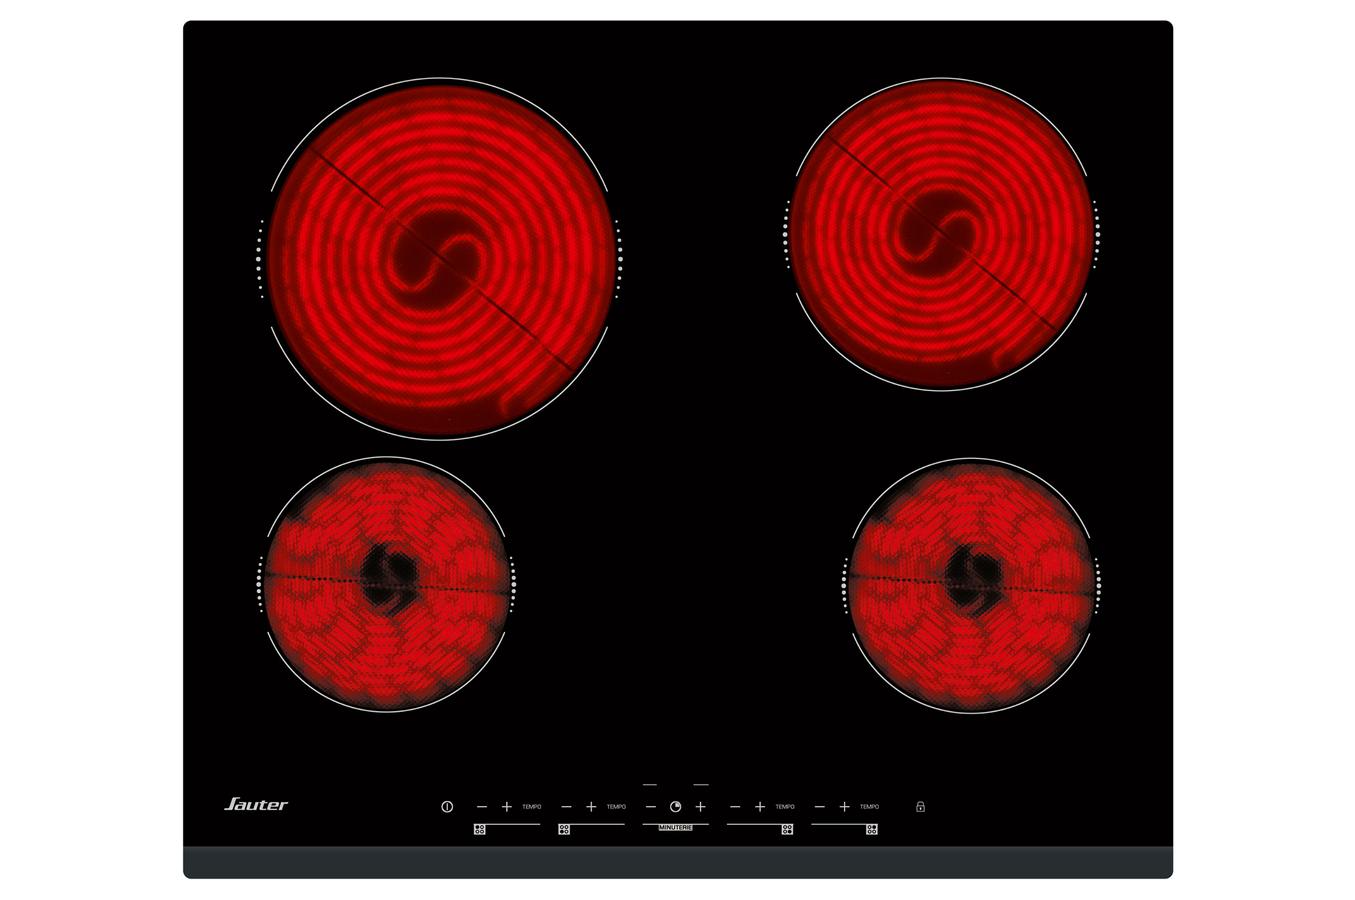 Table Vitroceramique Foyer Halogene : Plaque vitrocéramique sauter spv b darty